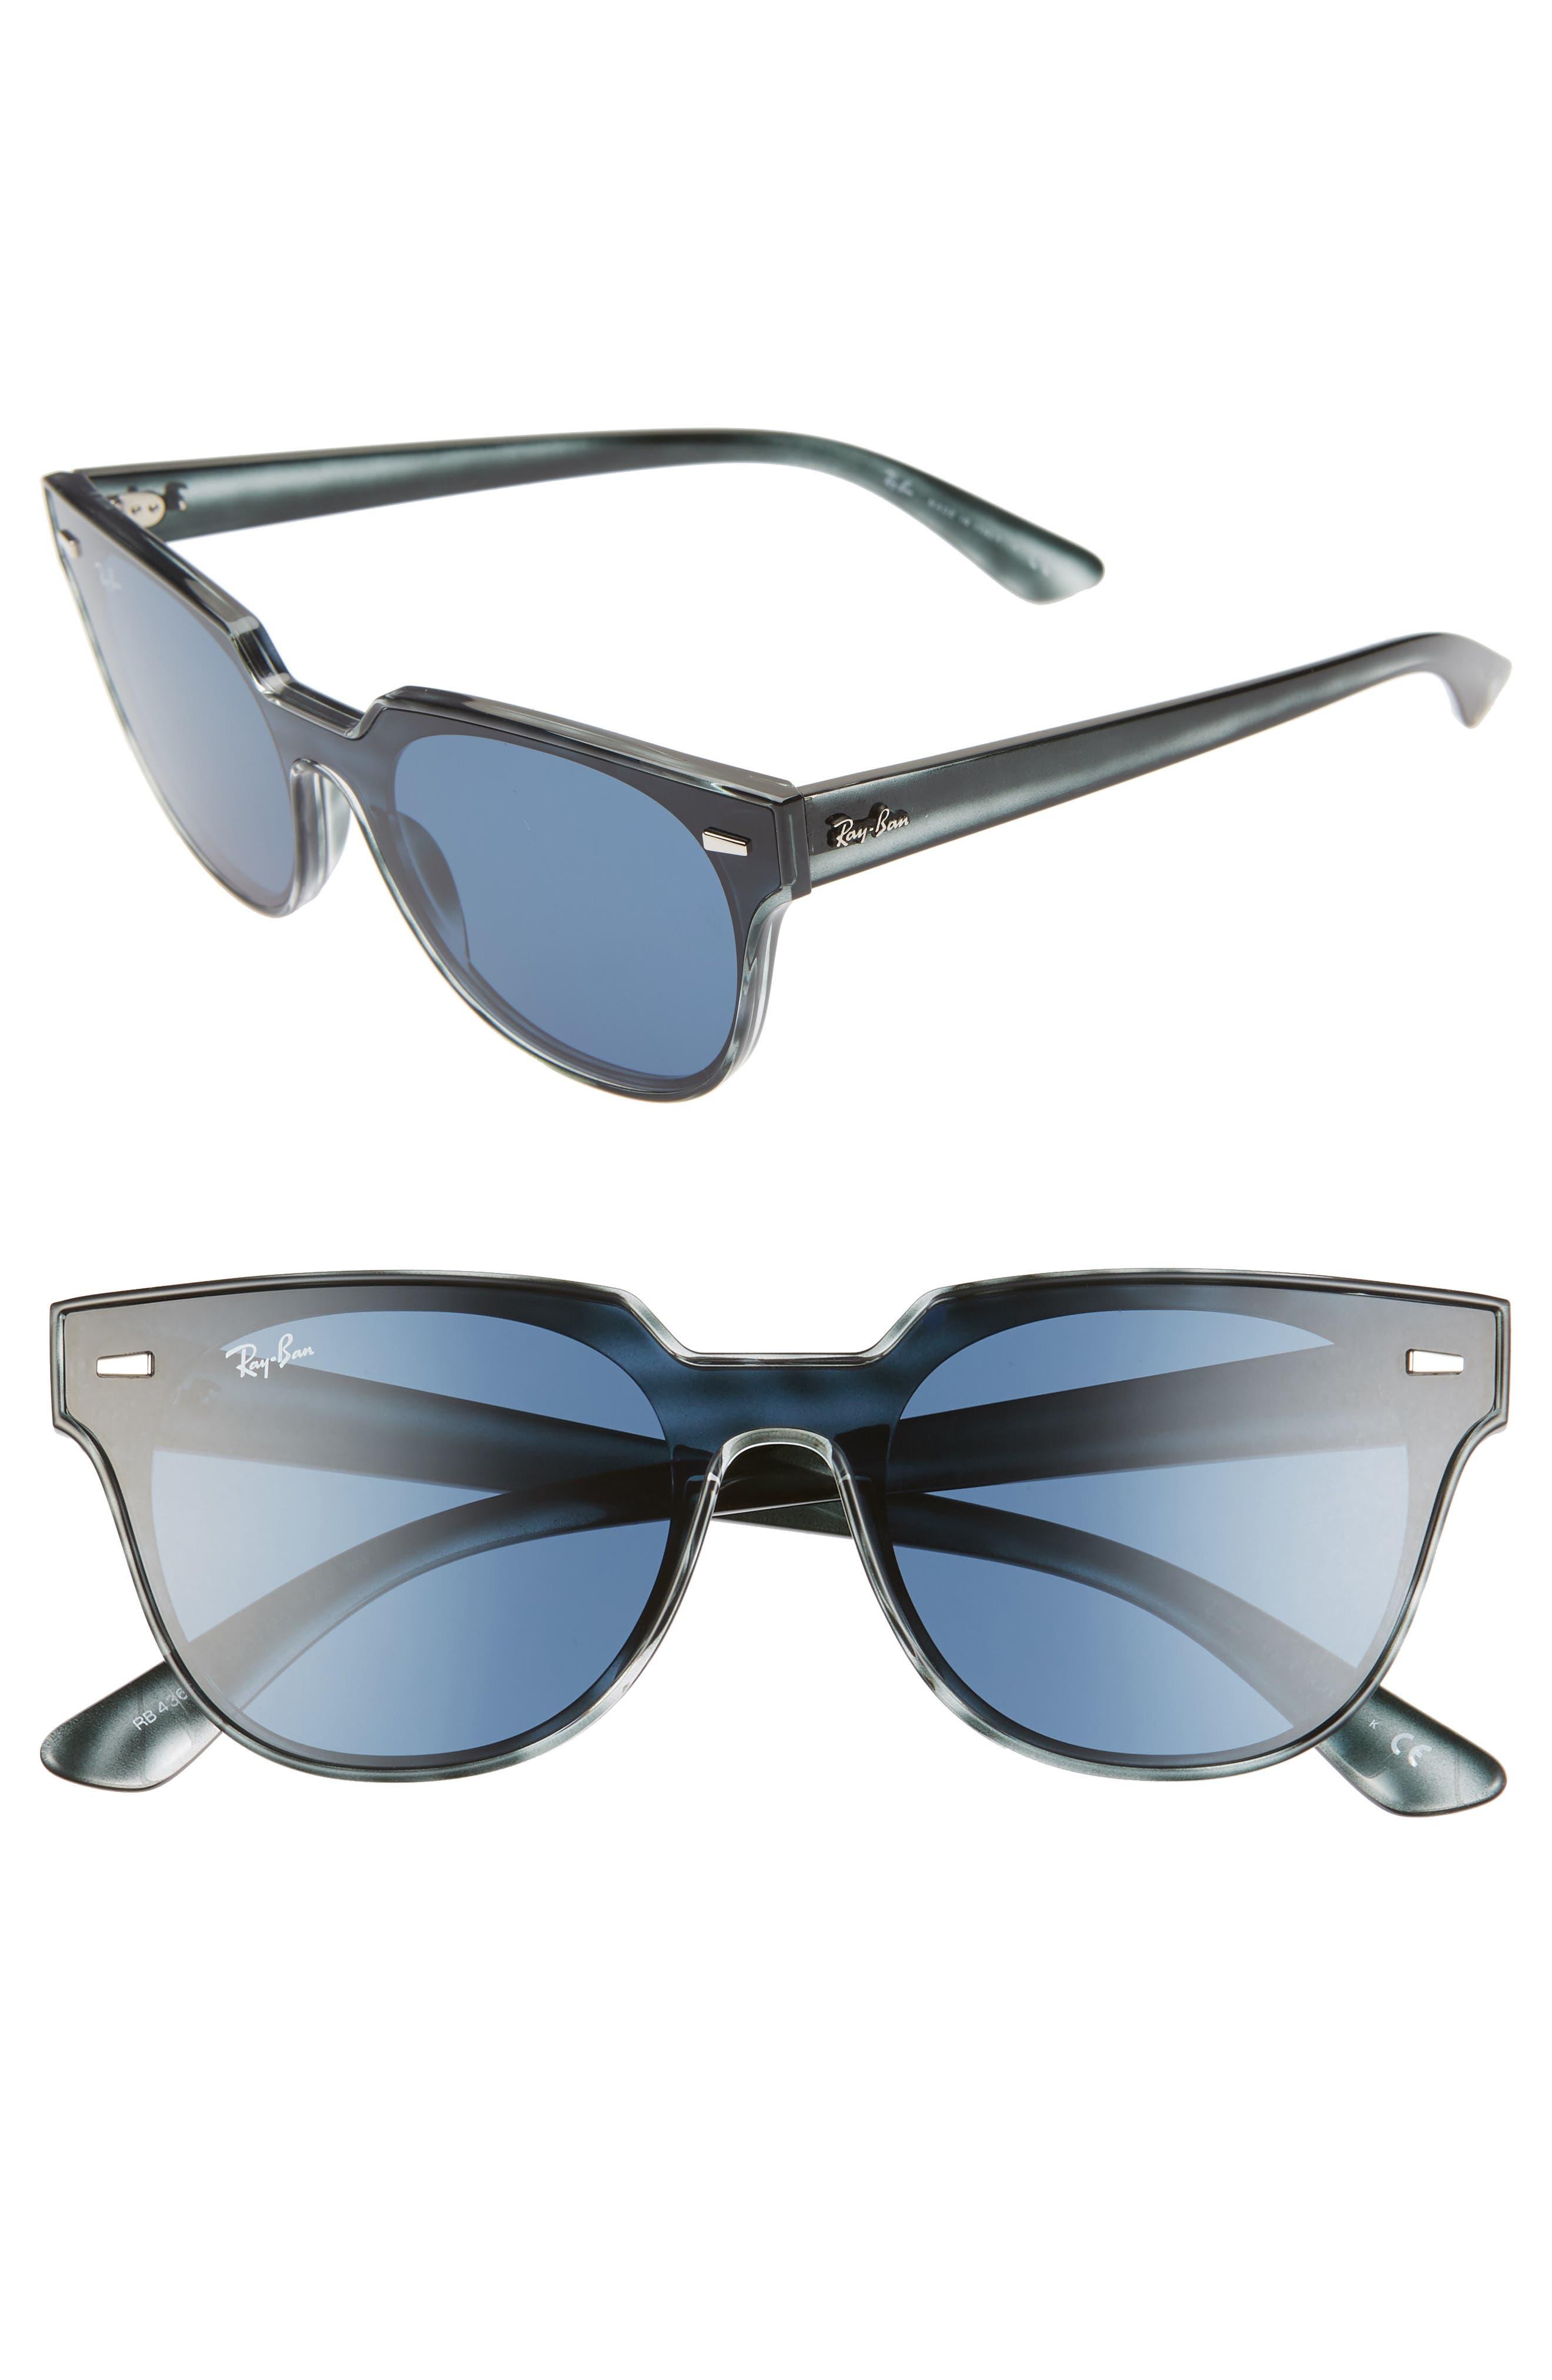 Ray-Ban 51Mm Square Sunglasses - Blue Havana/ Blue Solid